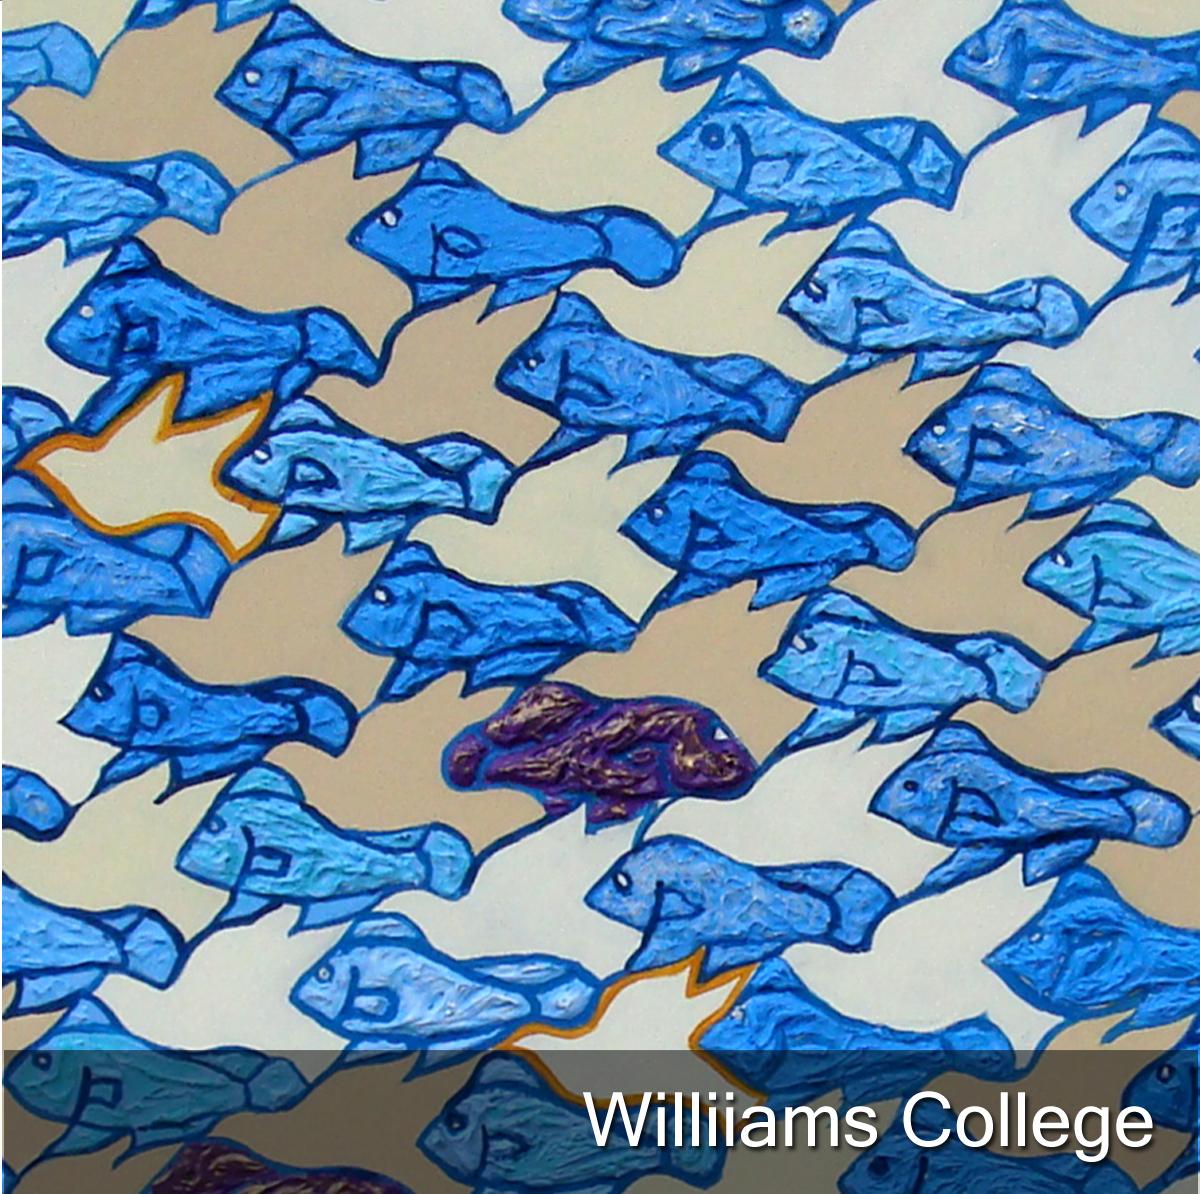 Wiliams college tile.jpg